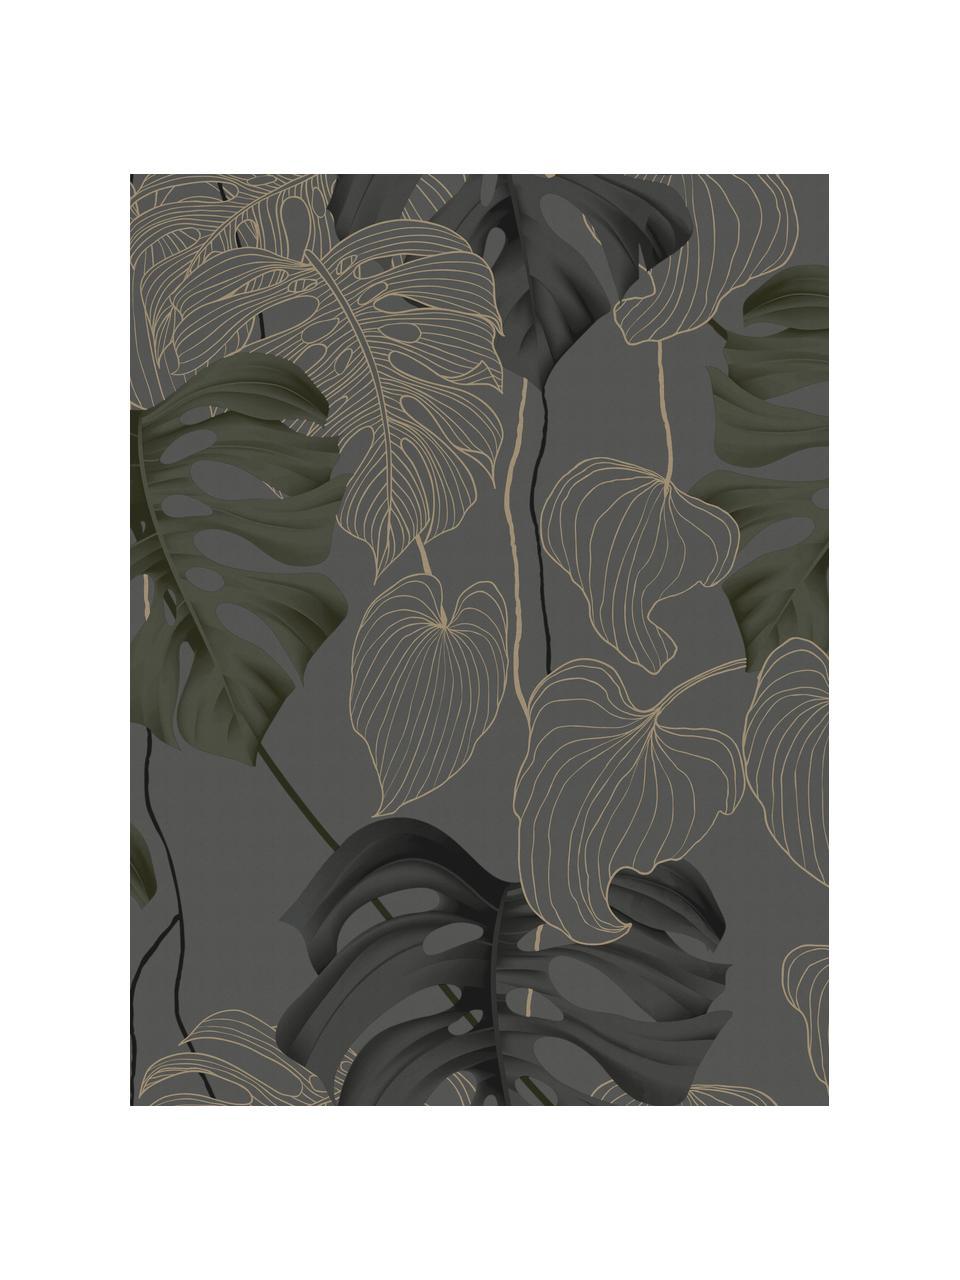 Carta da parati Paradiso, Tessuto non tessuto, Grigio, nero, verde, marrone, Larg. 52 x Alt. 1005 cm